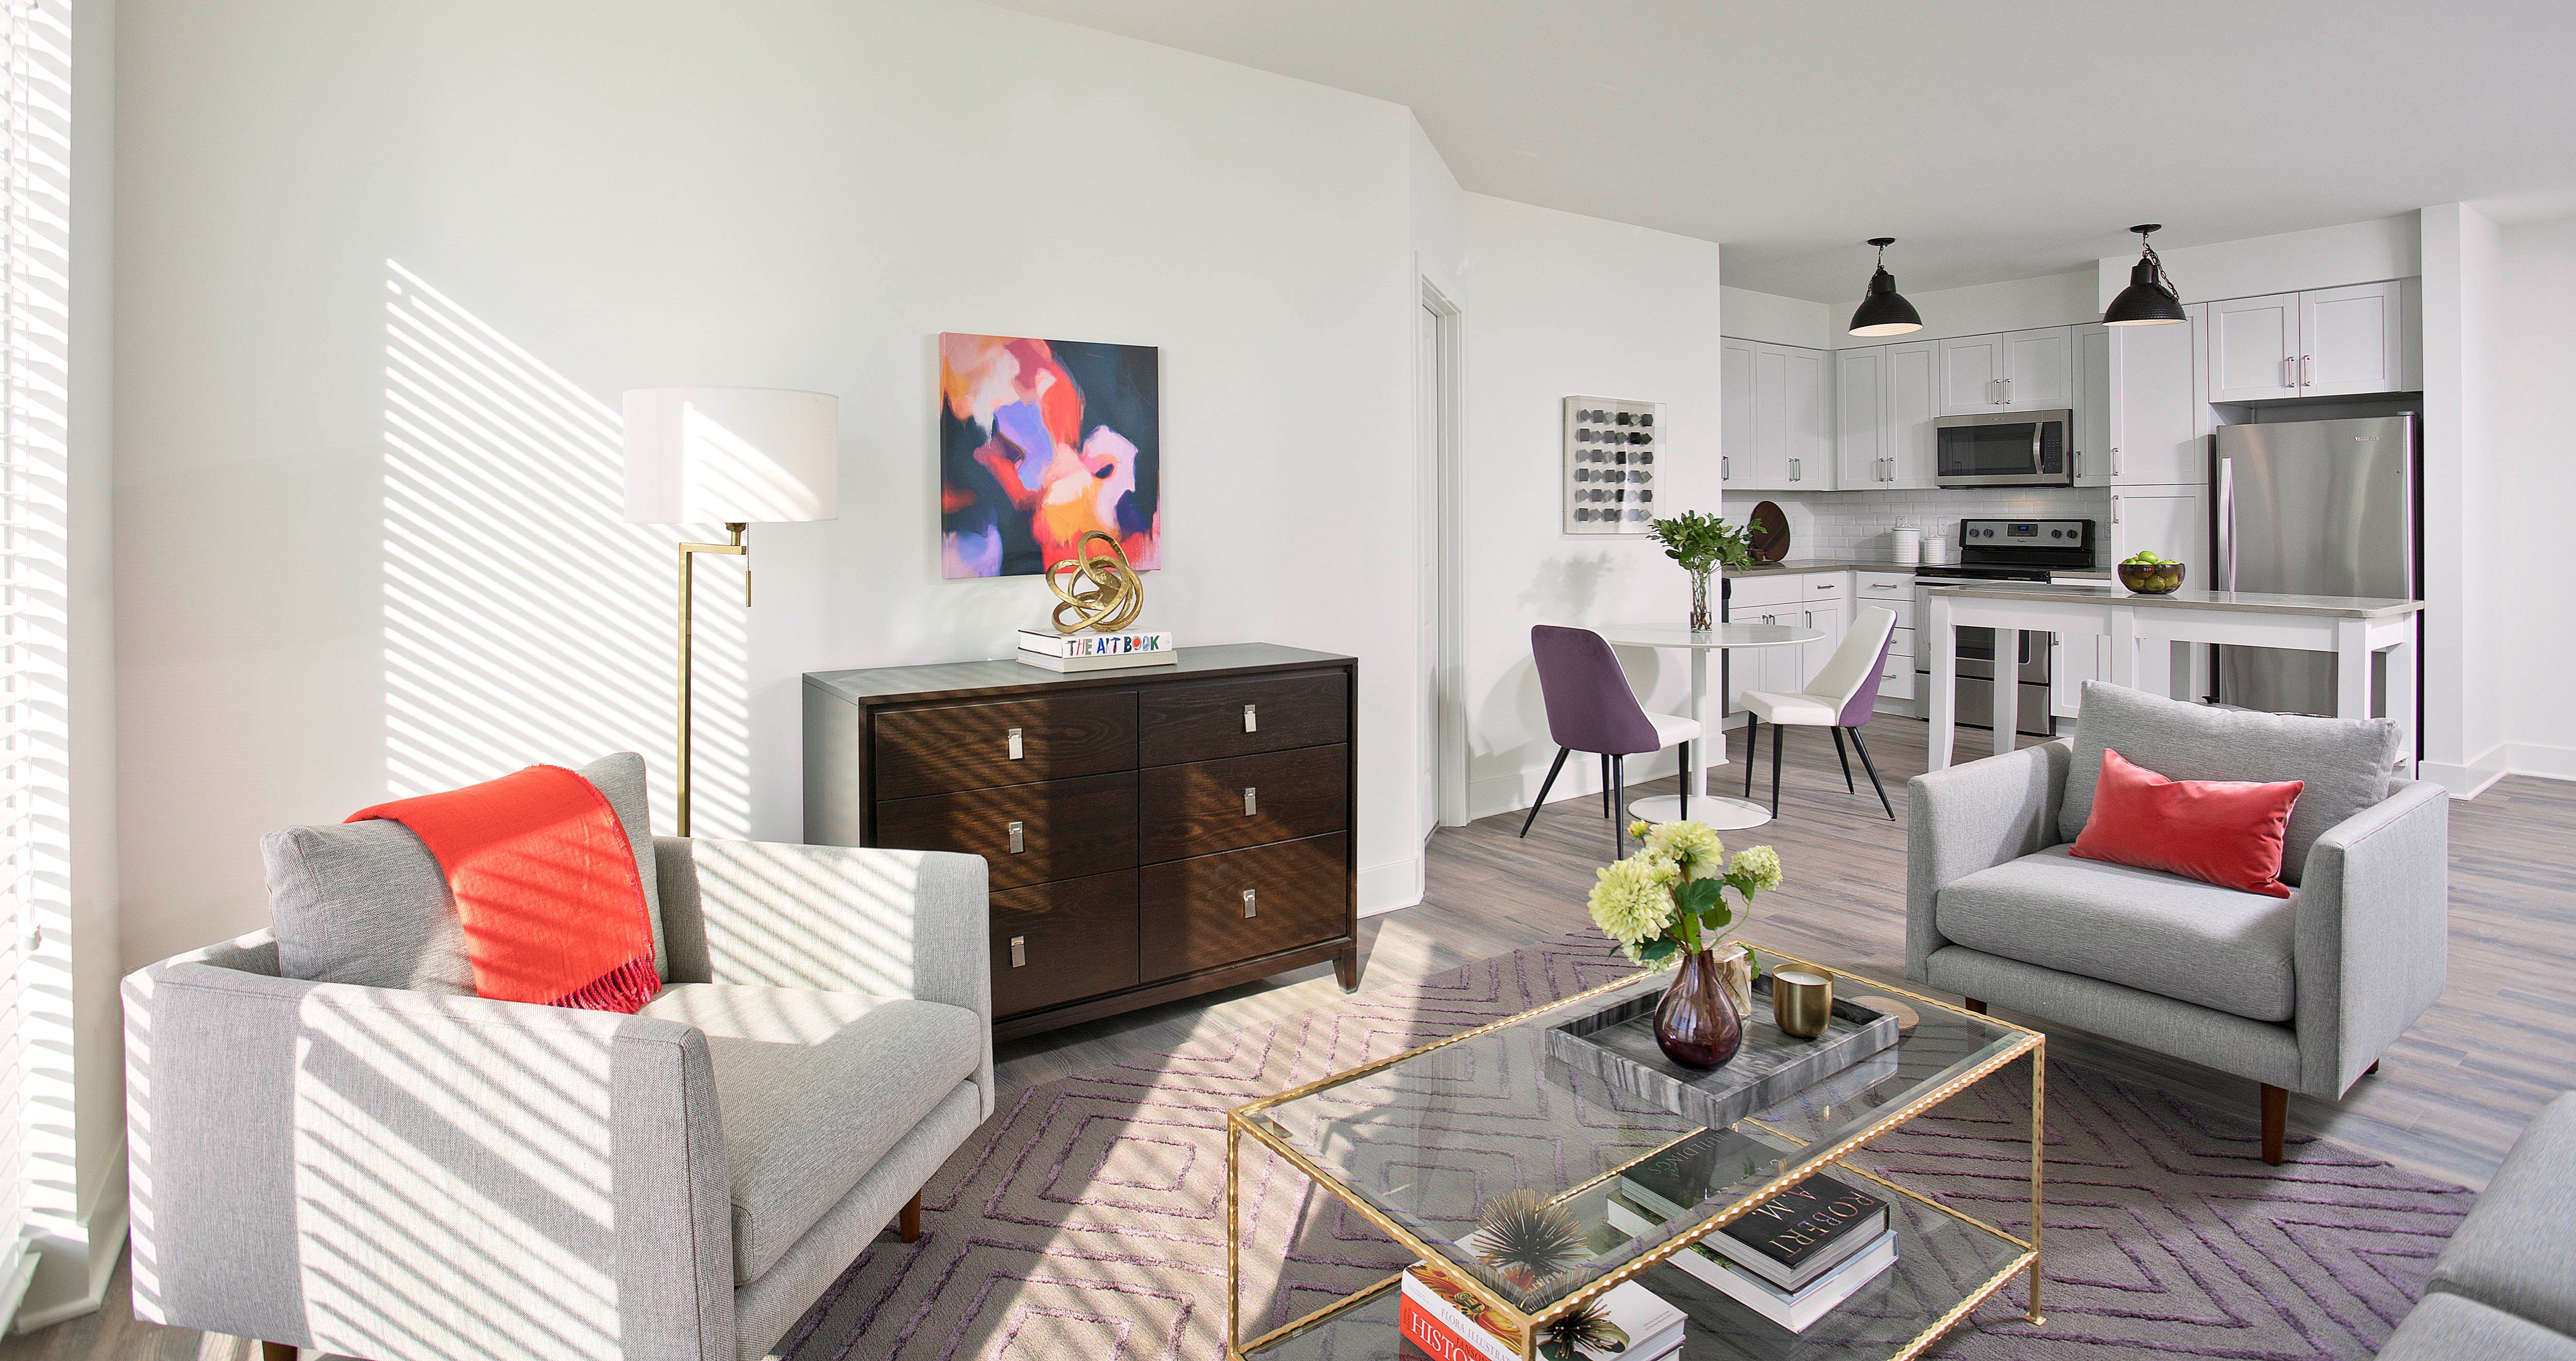 The Thornton Alexandria Va Ava Dsgn Spartansurfaces Floorscore Lvt Luxury Apartments Multifamily Housing Home